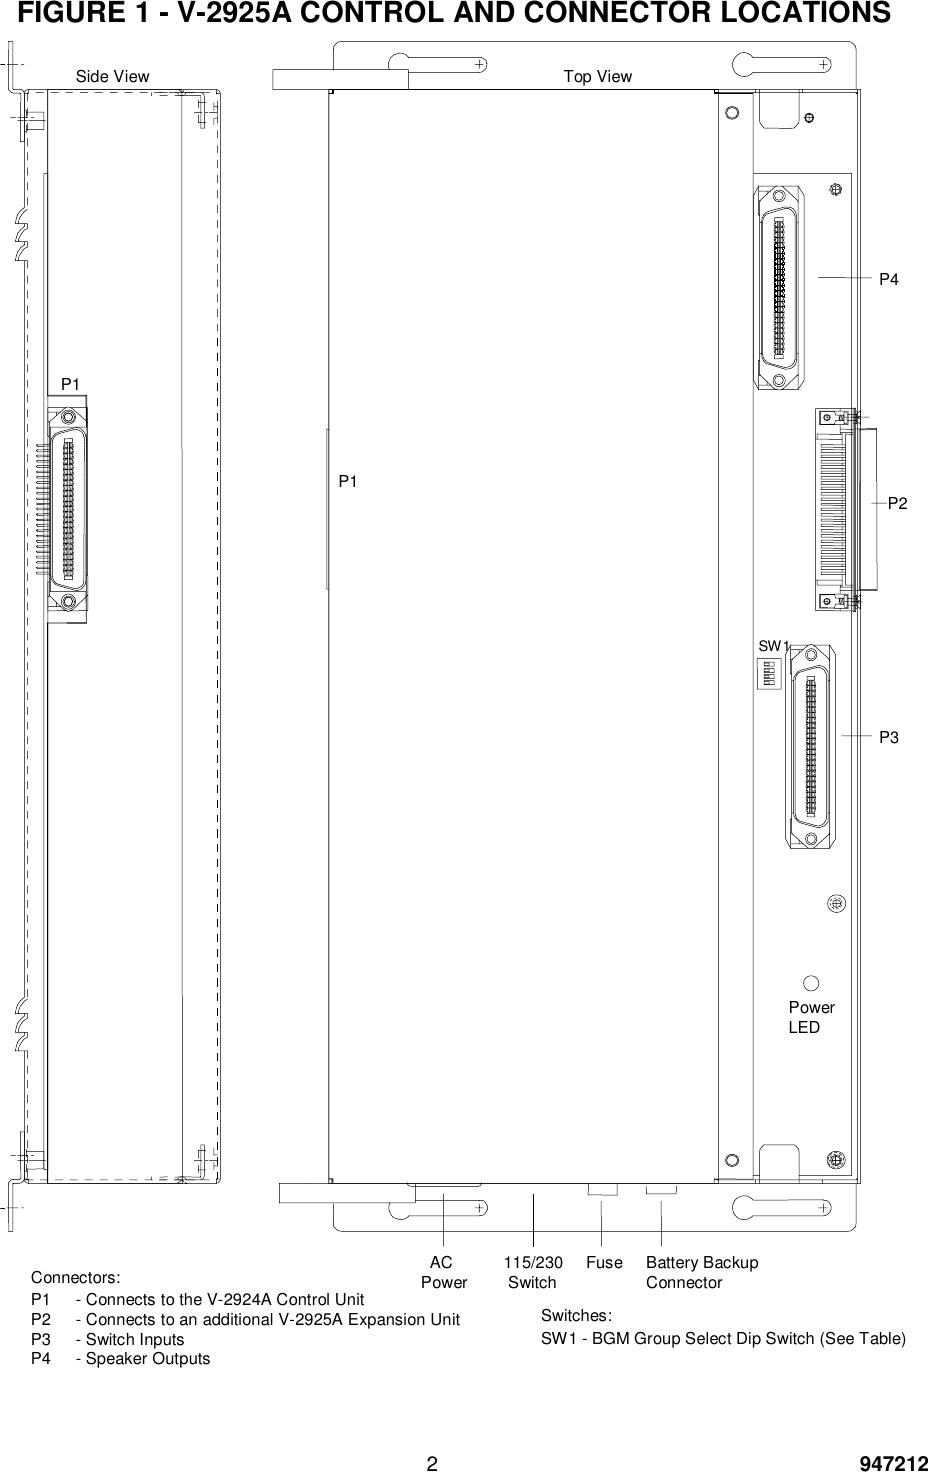 Outstanding Valcom Intercom System Vsp V 2925A Users Manual Wiring 101 Olytiaxxcnl